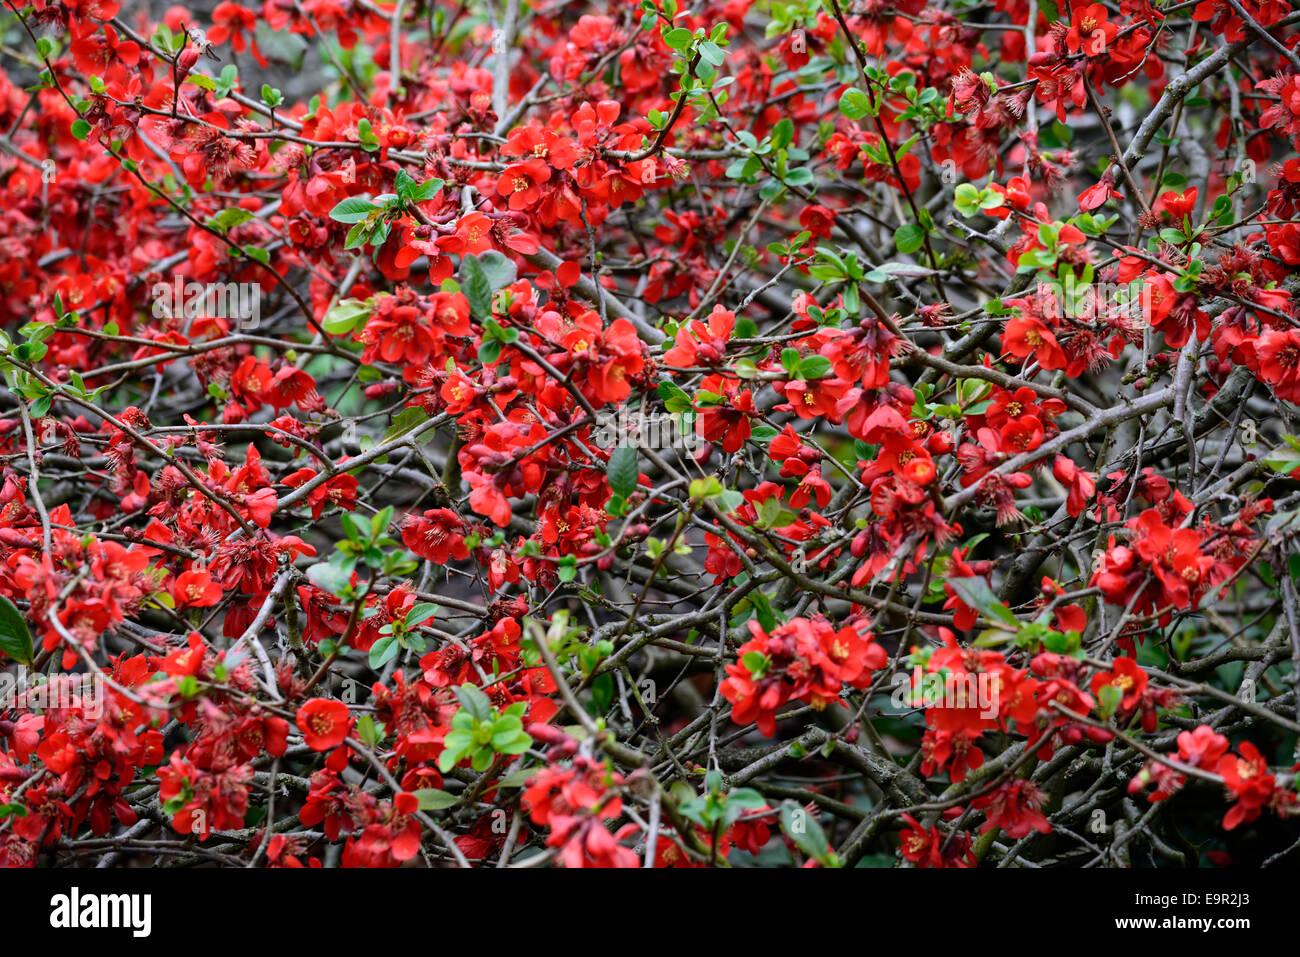 Chaenomeles Superba Boule De Feu Flowering Quince Hardy Cultivar